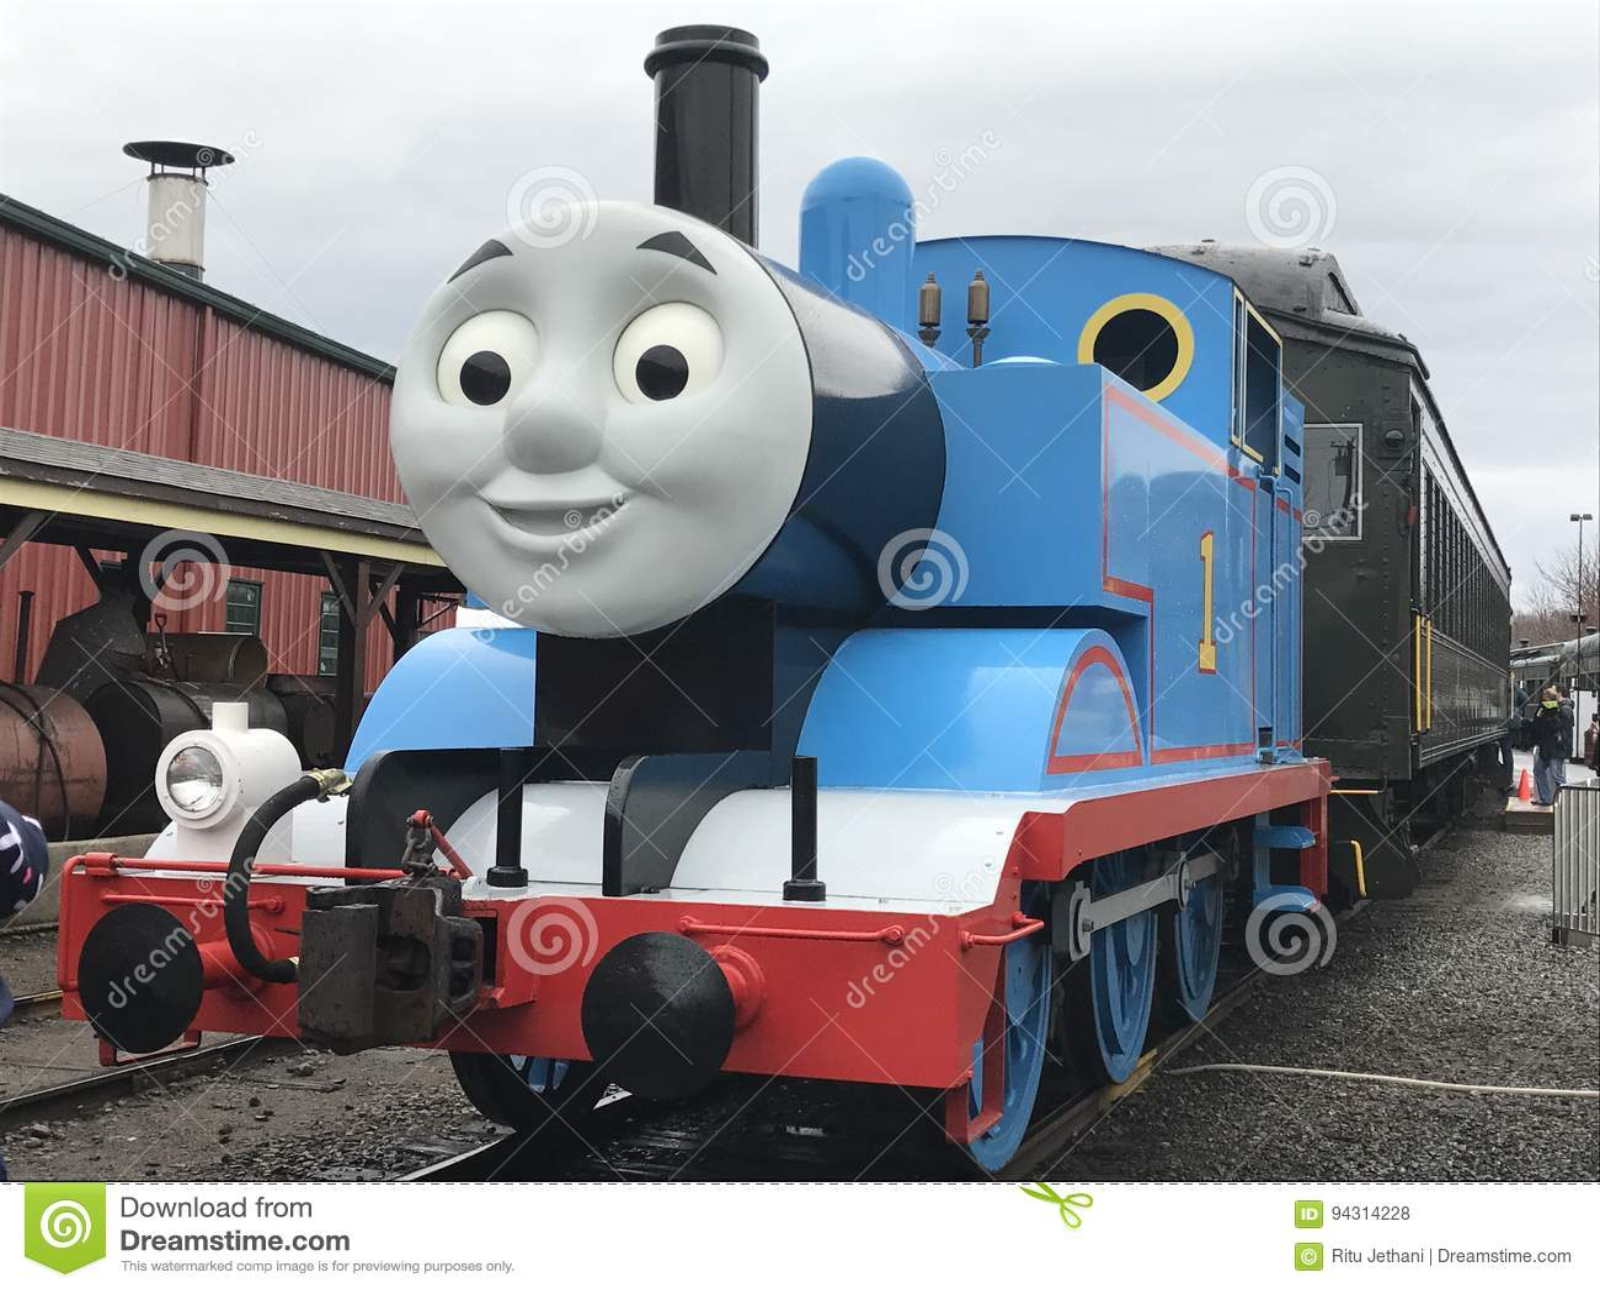 495 Thomas Train Photos Free Royalty Free Stock Photos From Dreamstime